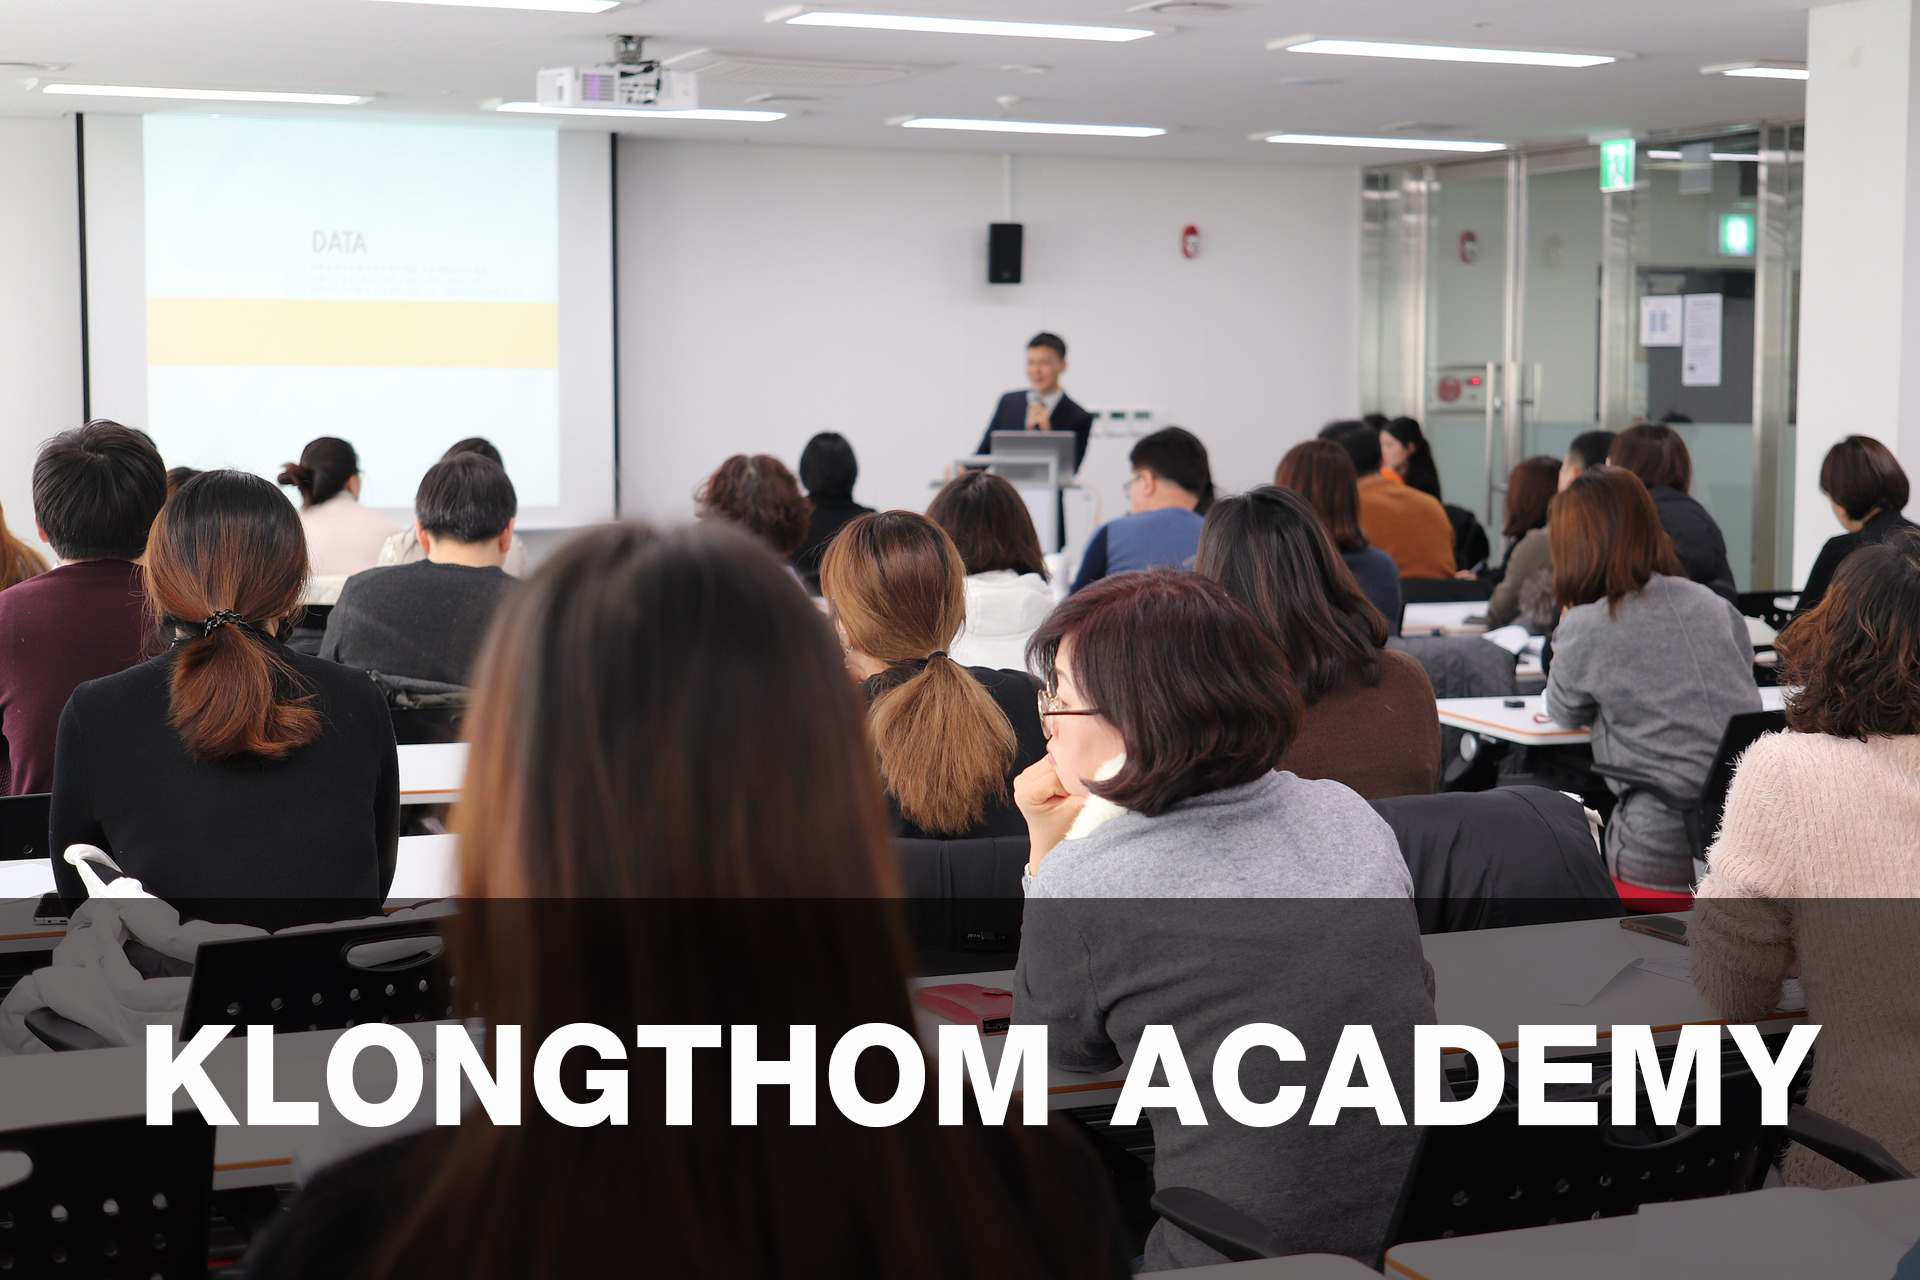 klongthom akademy02.jpg